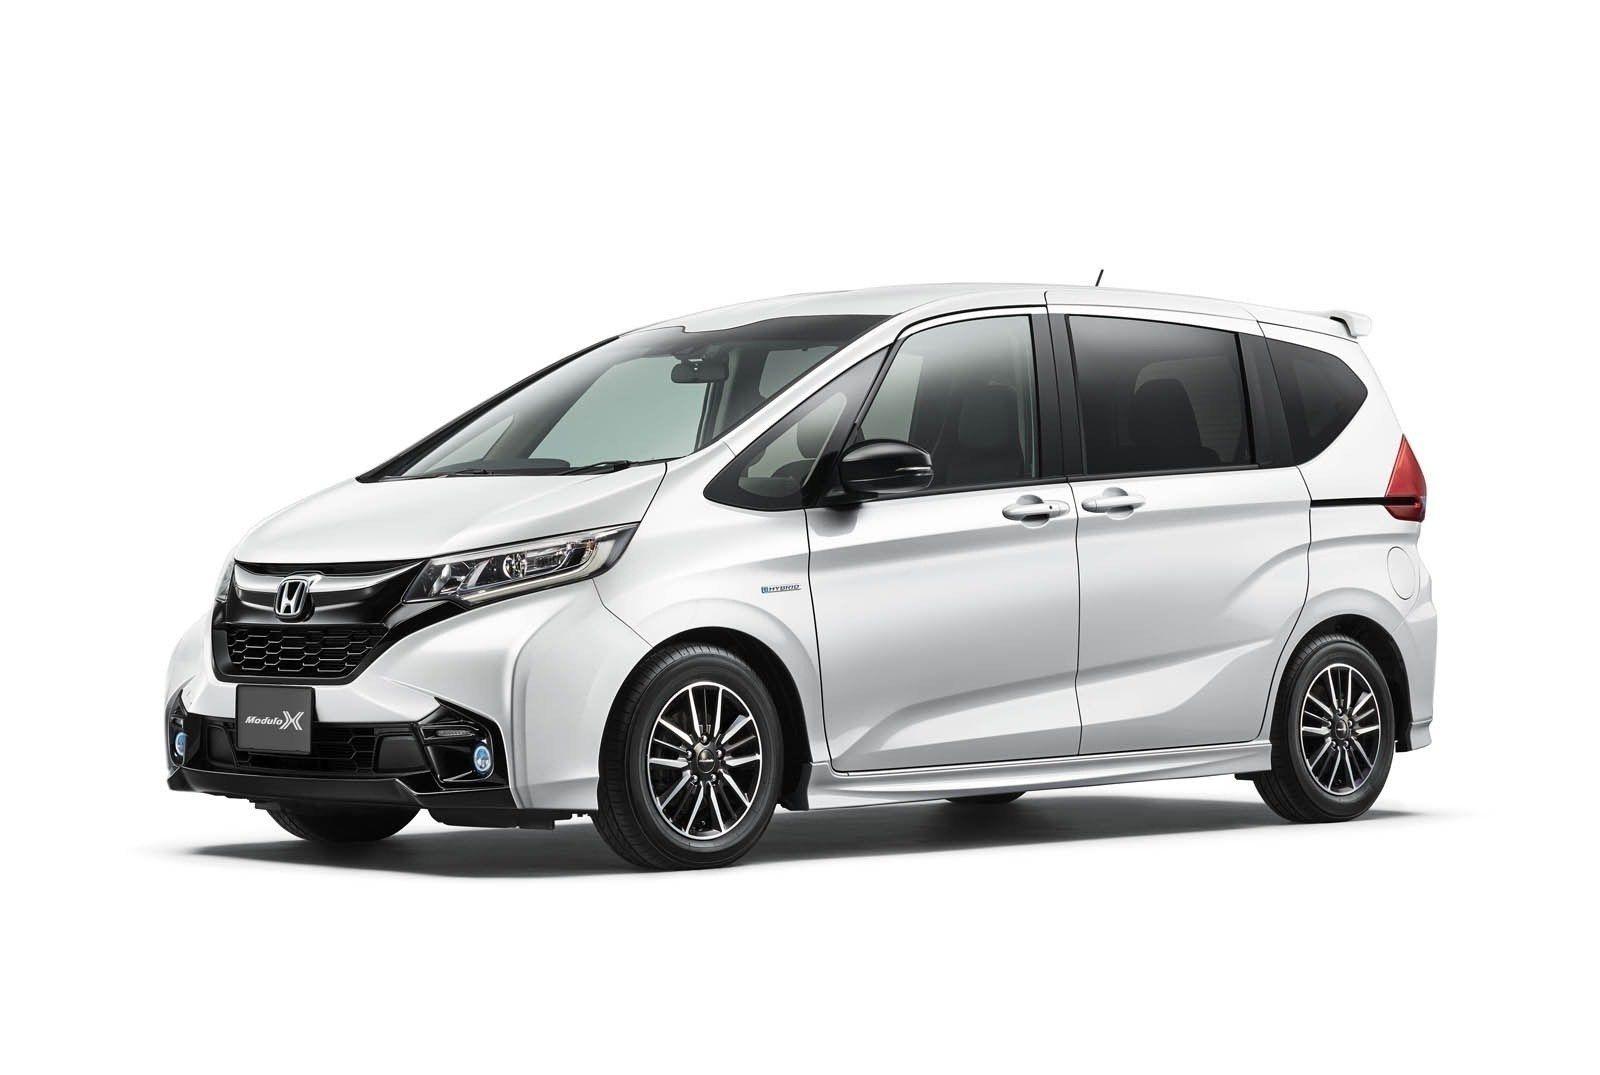 Kekurangan Harga Honda Freed 2018 Murah Berkualitas